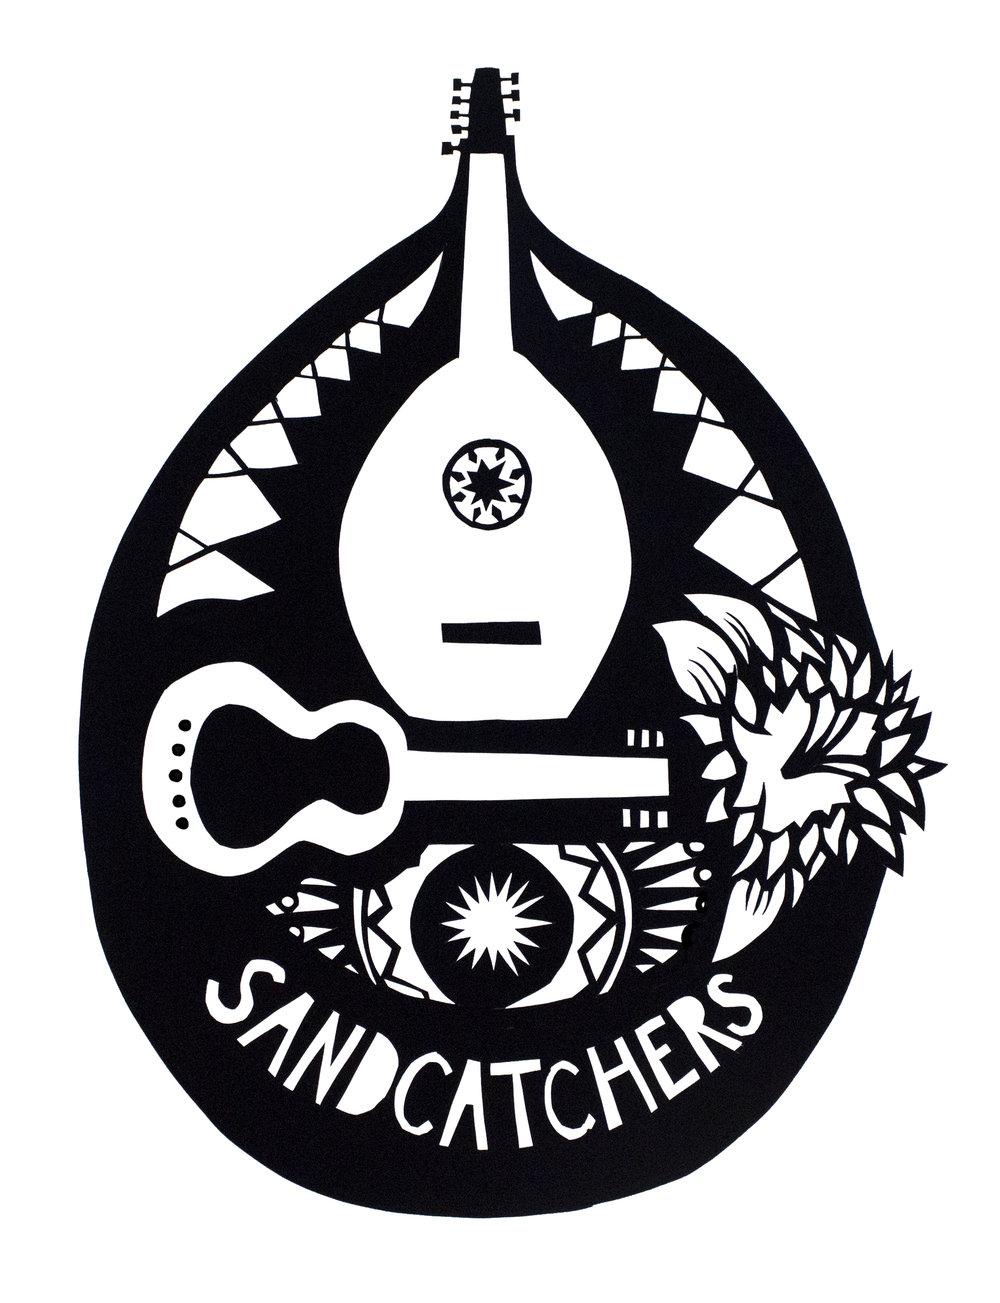 Sandcatchers Logo 1.0.jpg